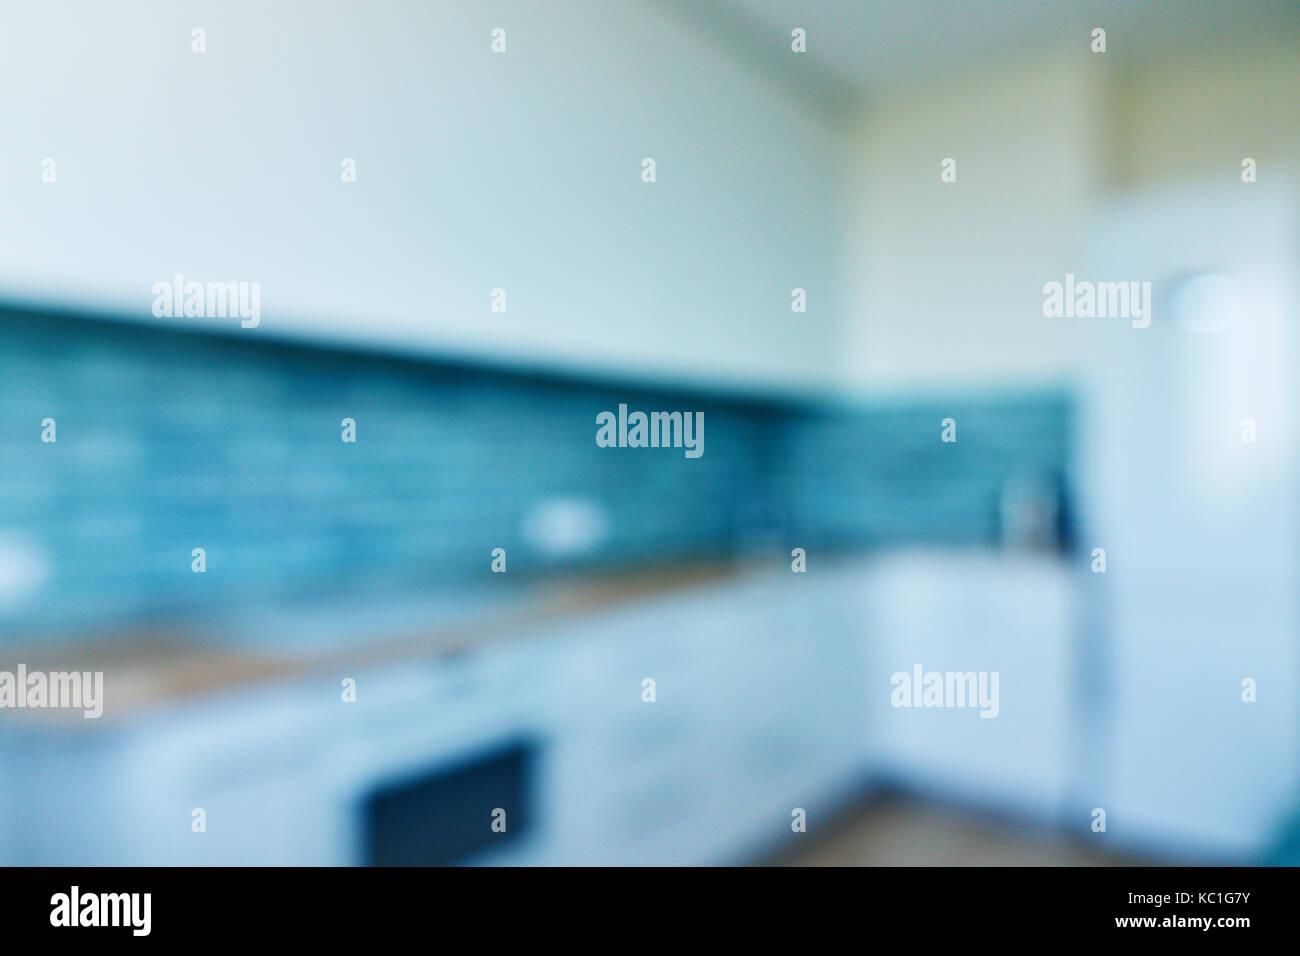 Blur background, white kitchen with blue ceramic tiles Stock Photo ...